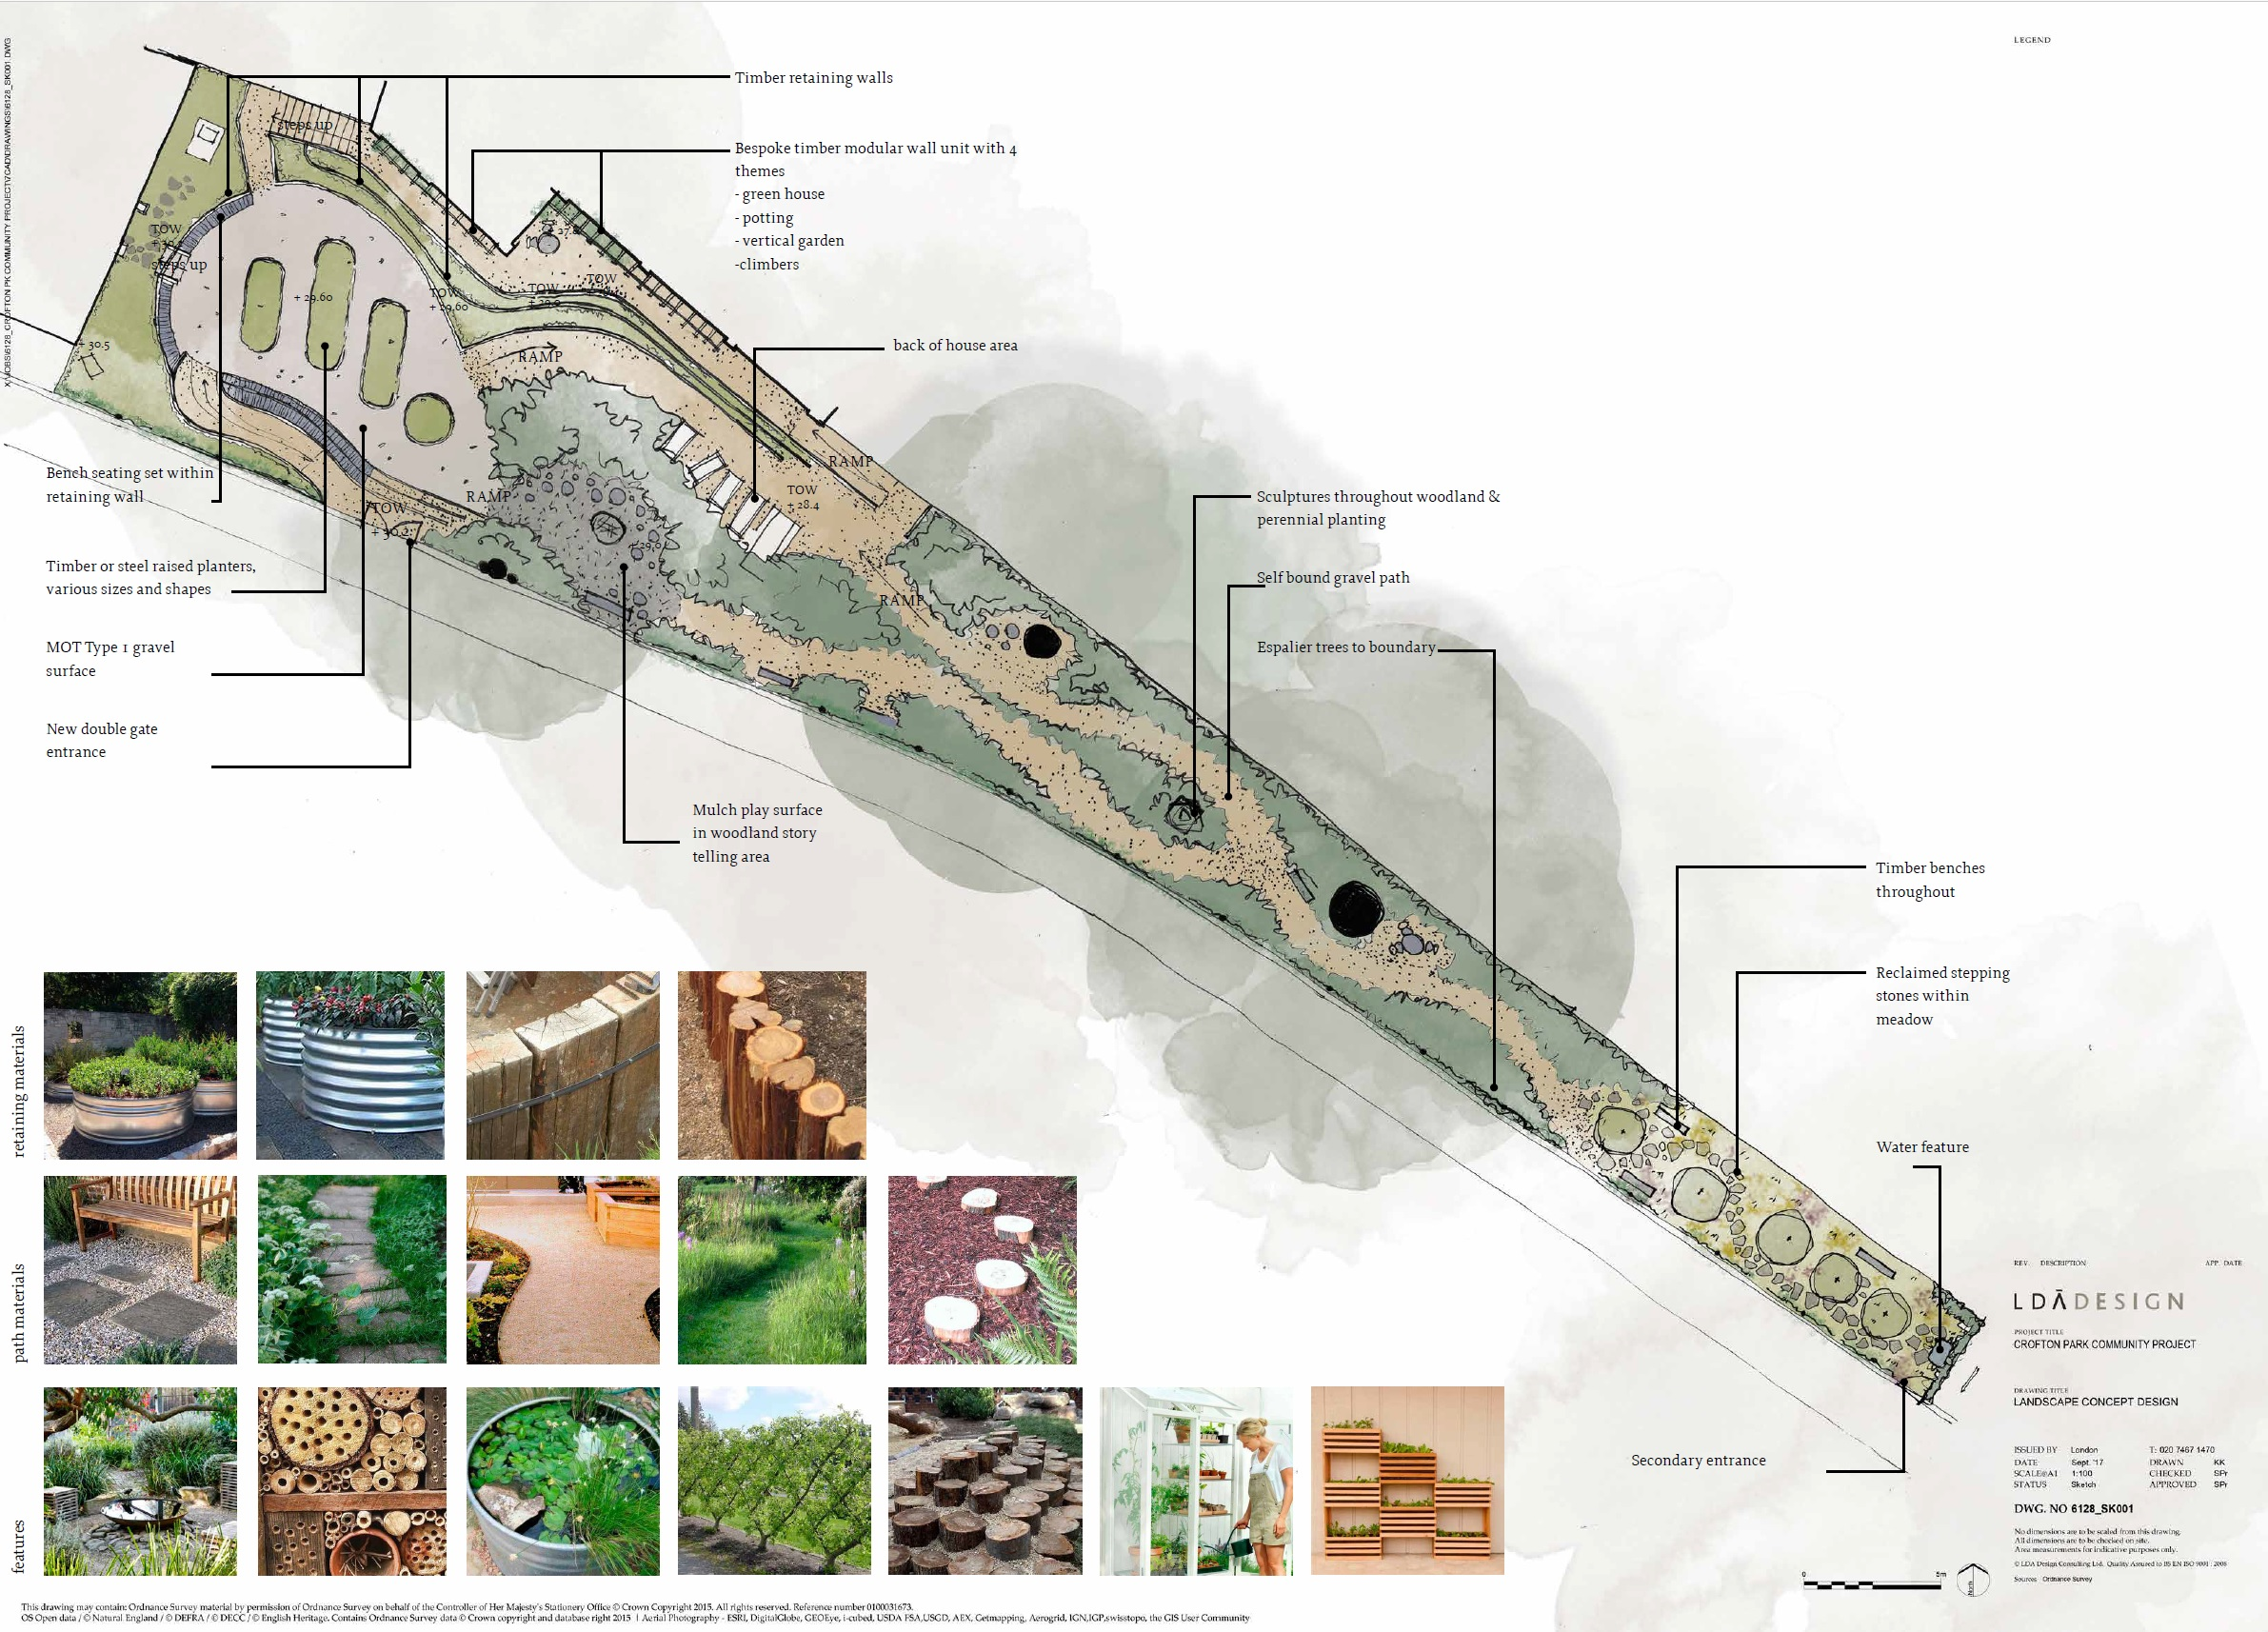 Concept Design by LDA Design – Crofton Park Railway Garden